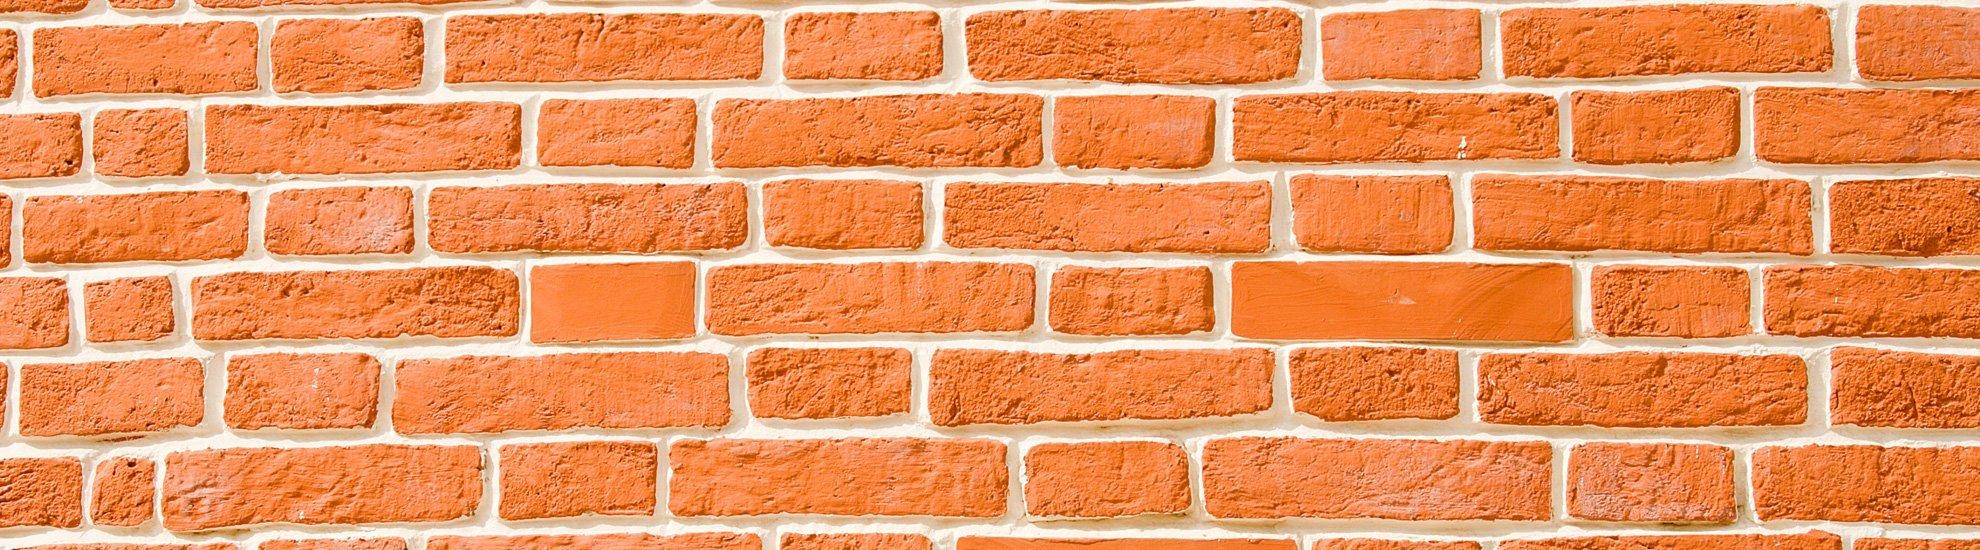 brick walling